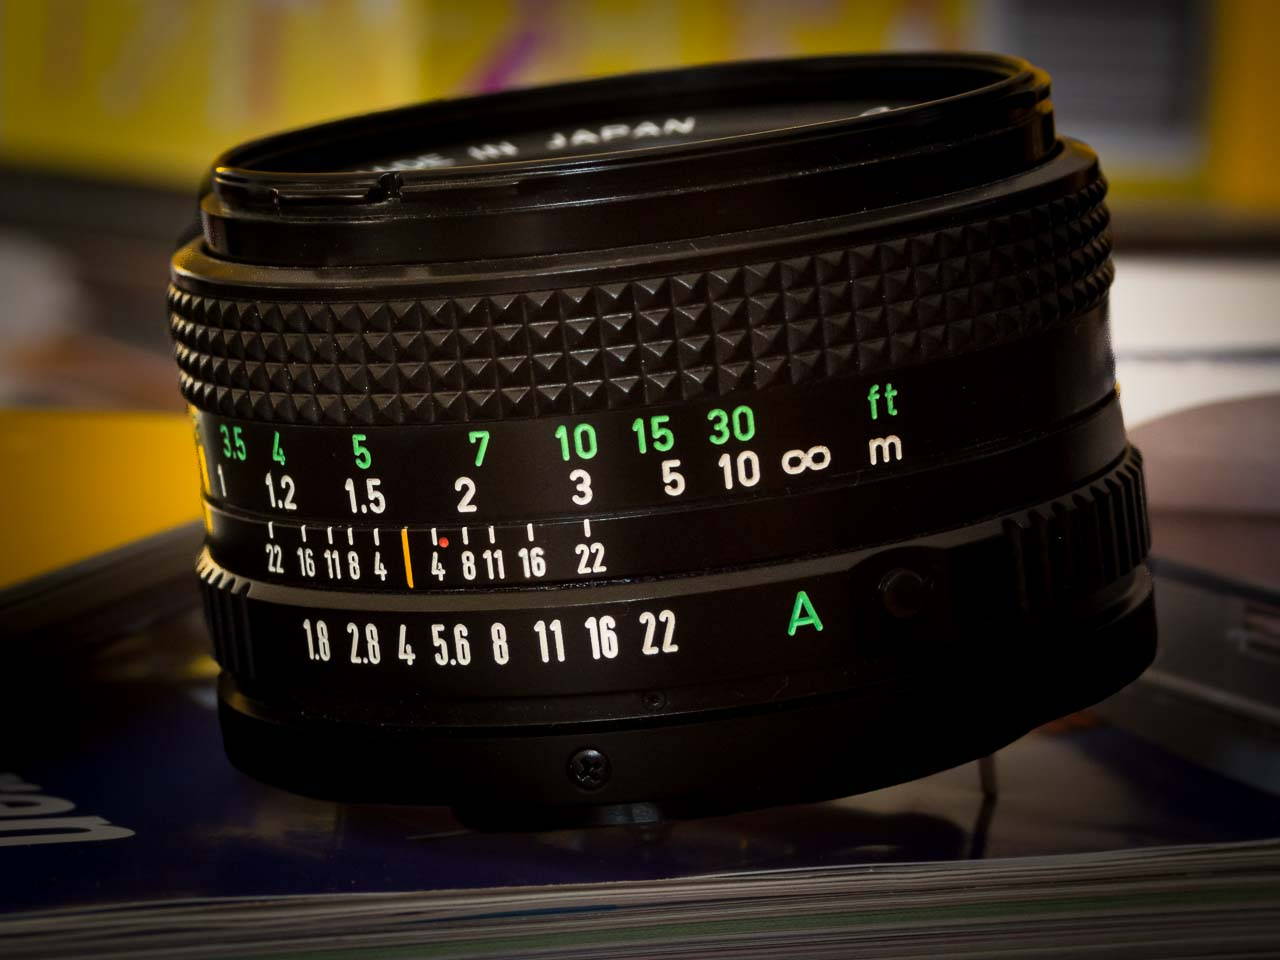 FD 50mm 1:1.8